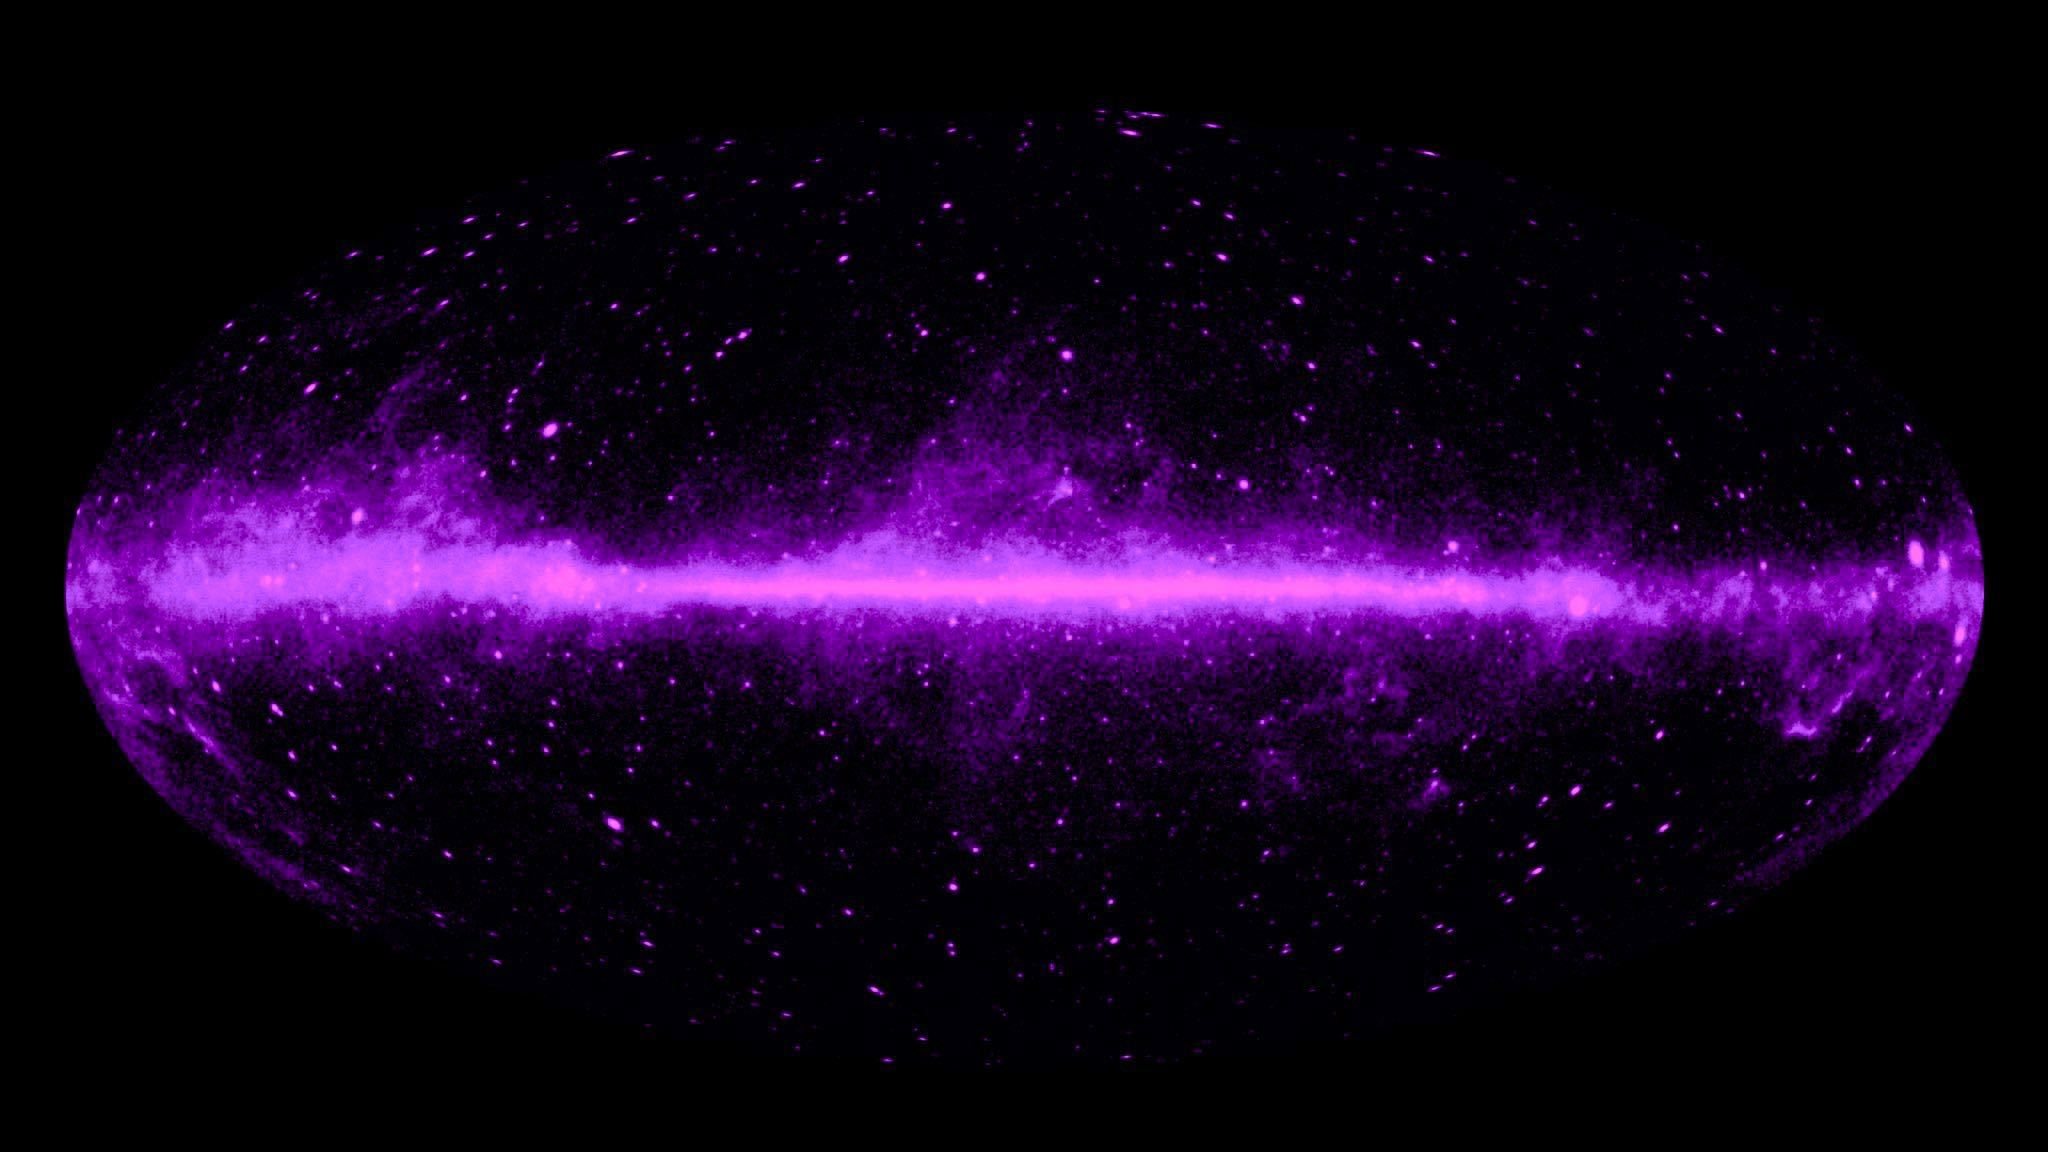 dark matter Dark matter has been cancelled, follow @darkmatterftl for the twitter fan  campaign about dark matter the six-person crew of a derelict spaceship  awakens.